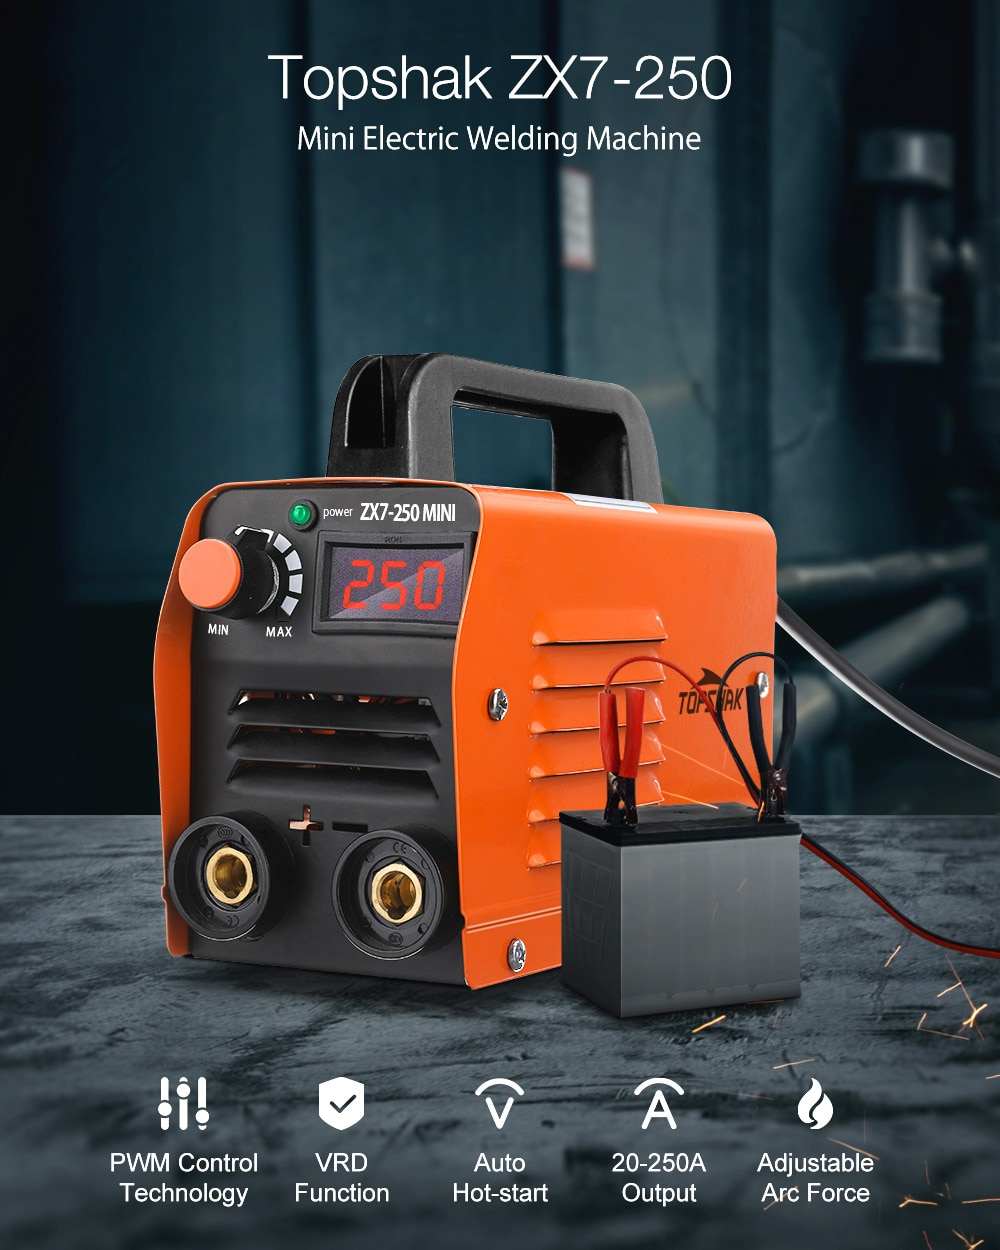 ZX7-250 250A Mini Electric Welding Machine Portable Digital Display MMA ARC DC Inverter Plastic-welder Weld Equipment